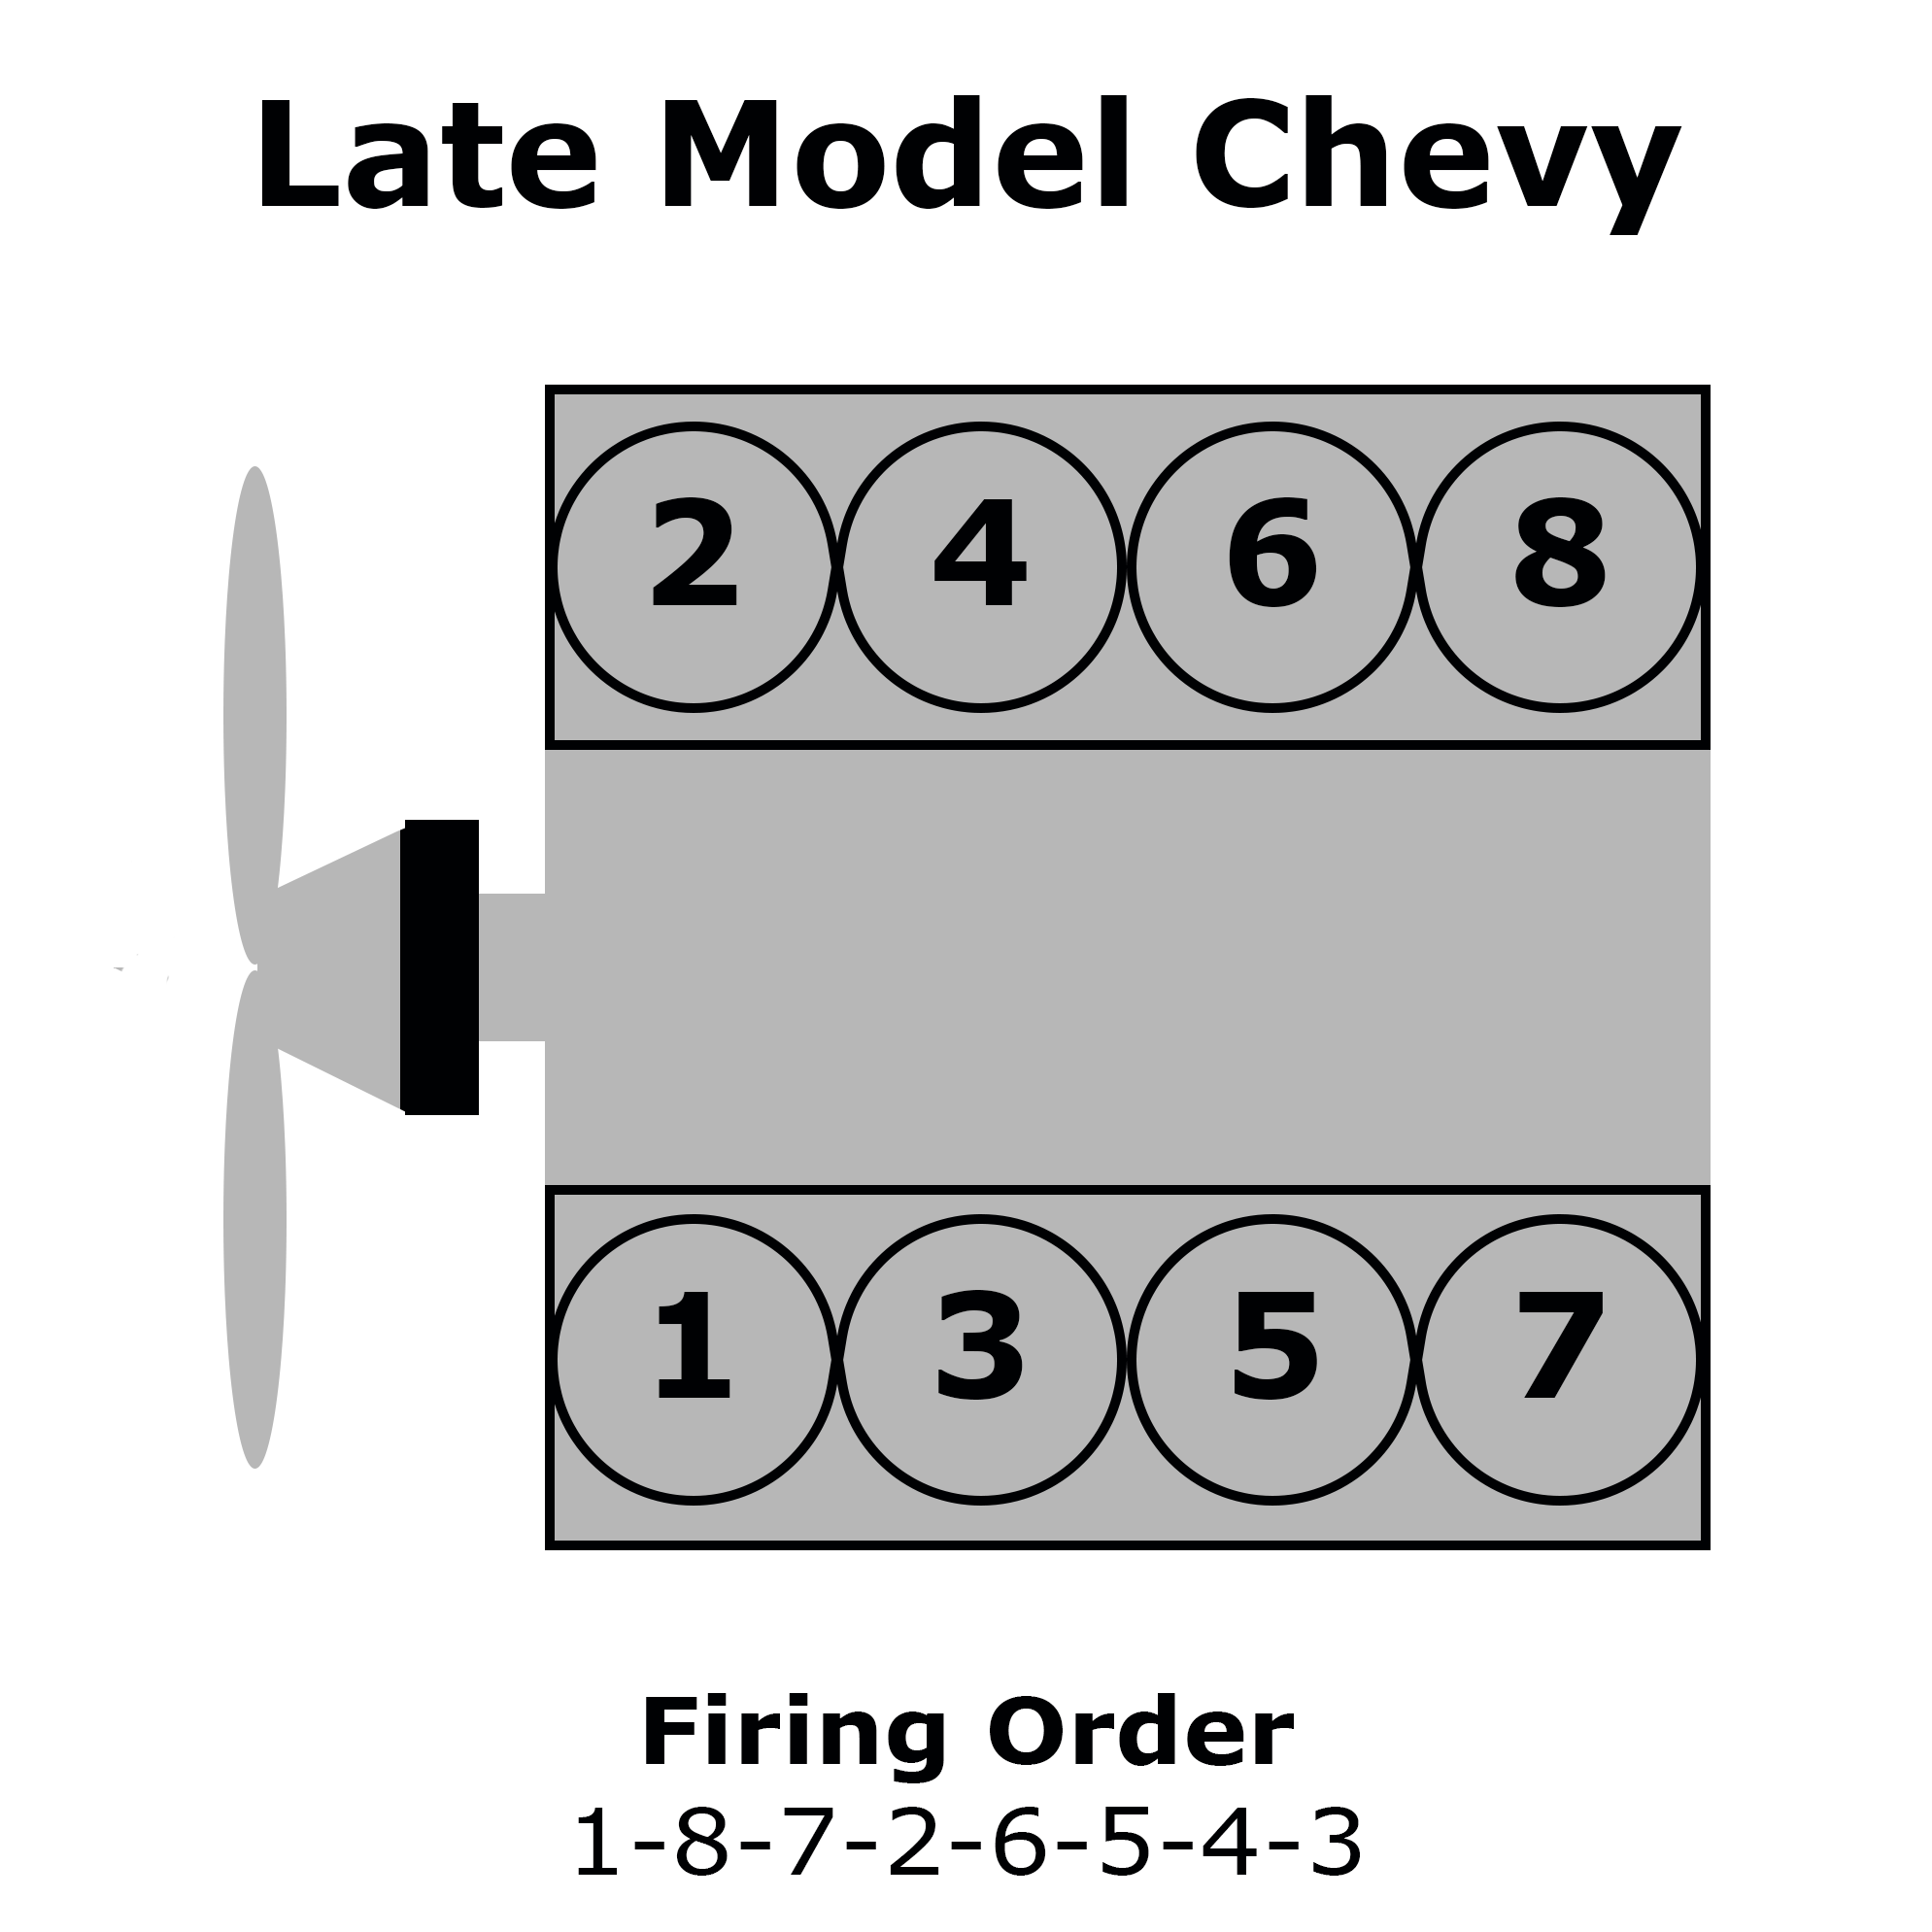 Chevy 5 3 Firing Order Diagram - Center Wiring Diagram Slim